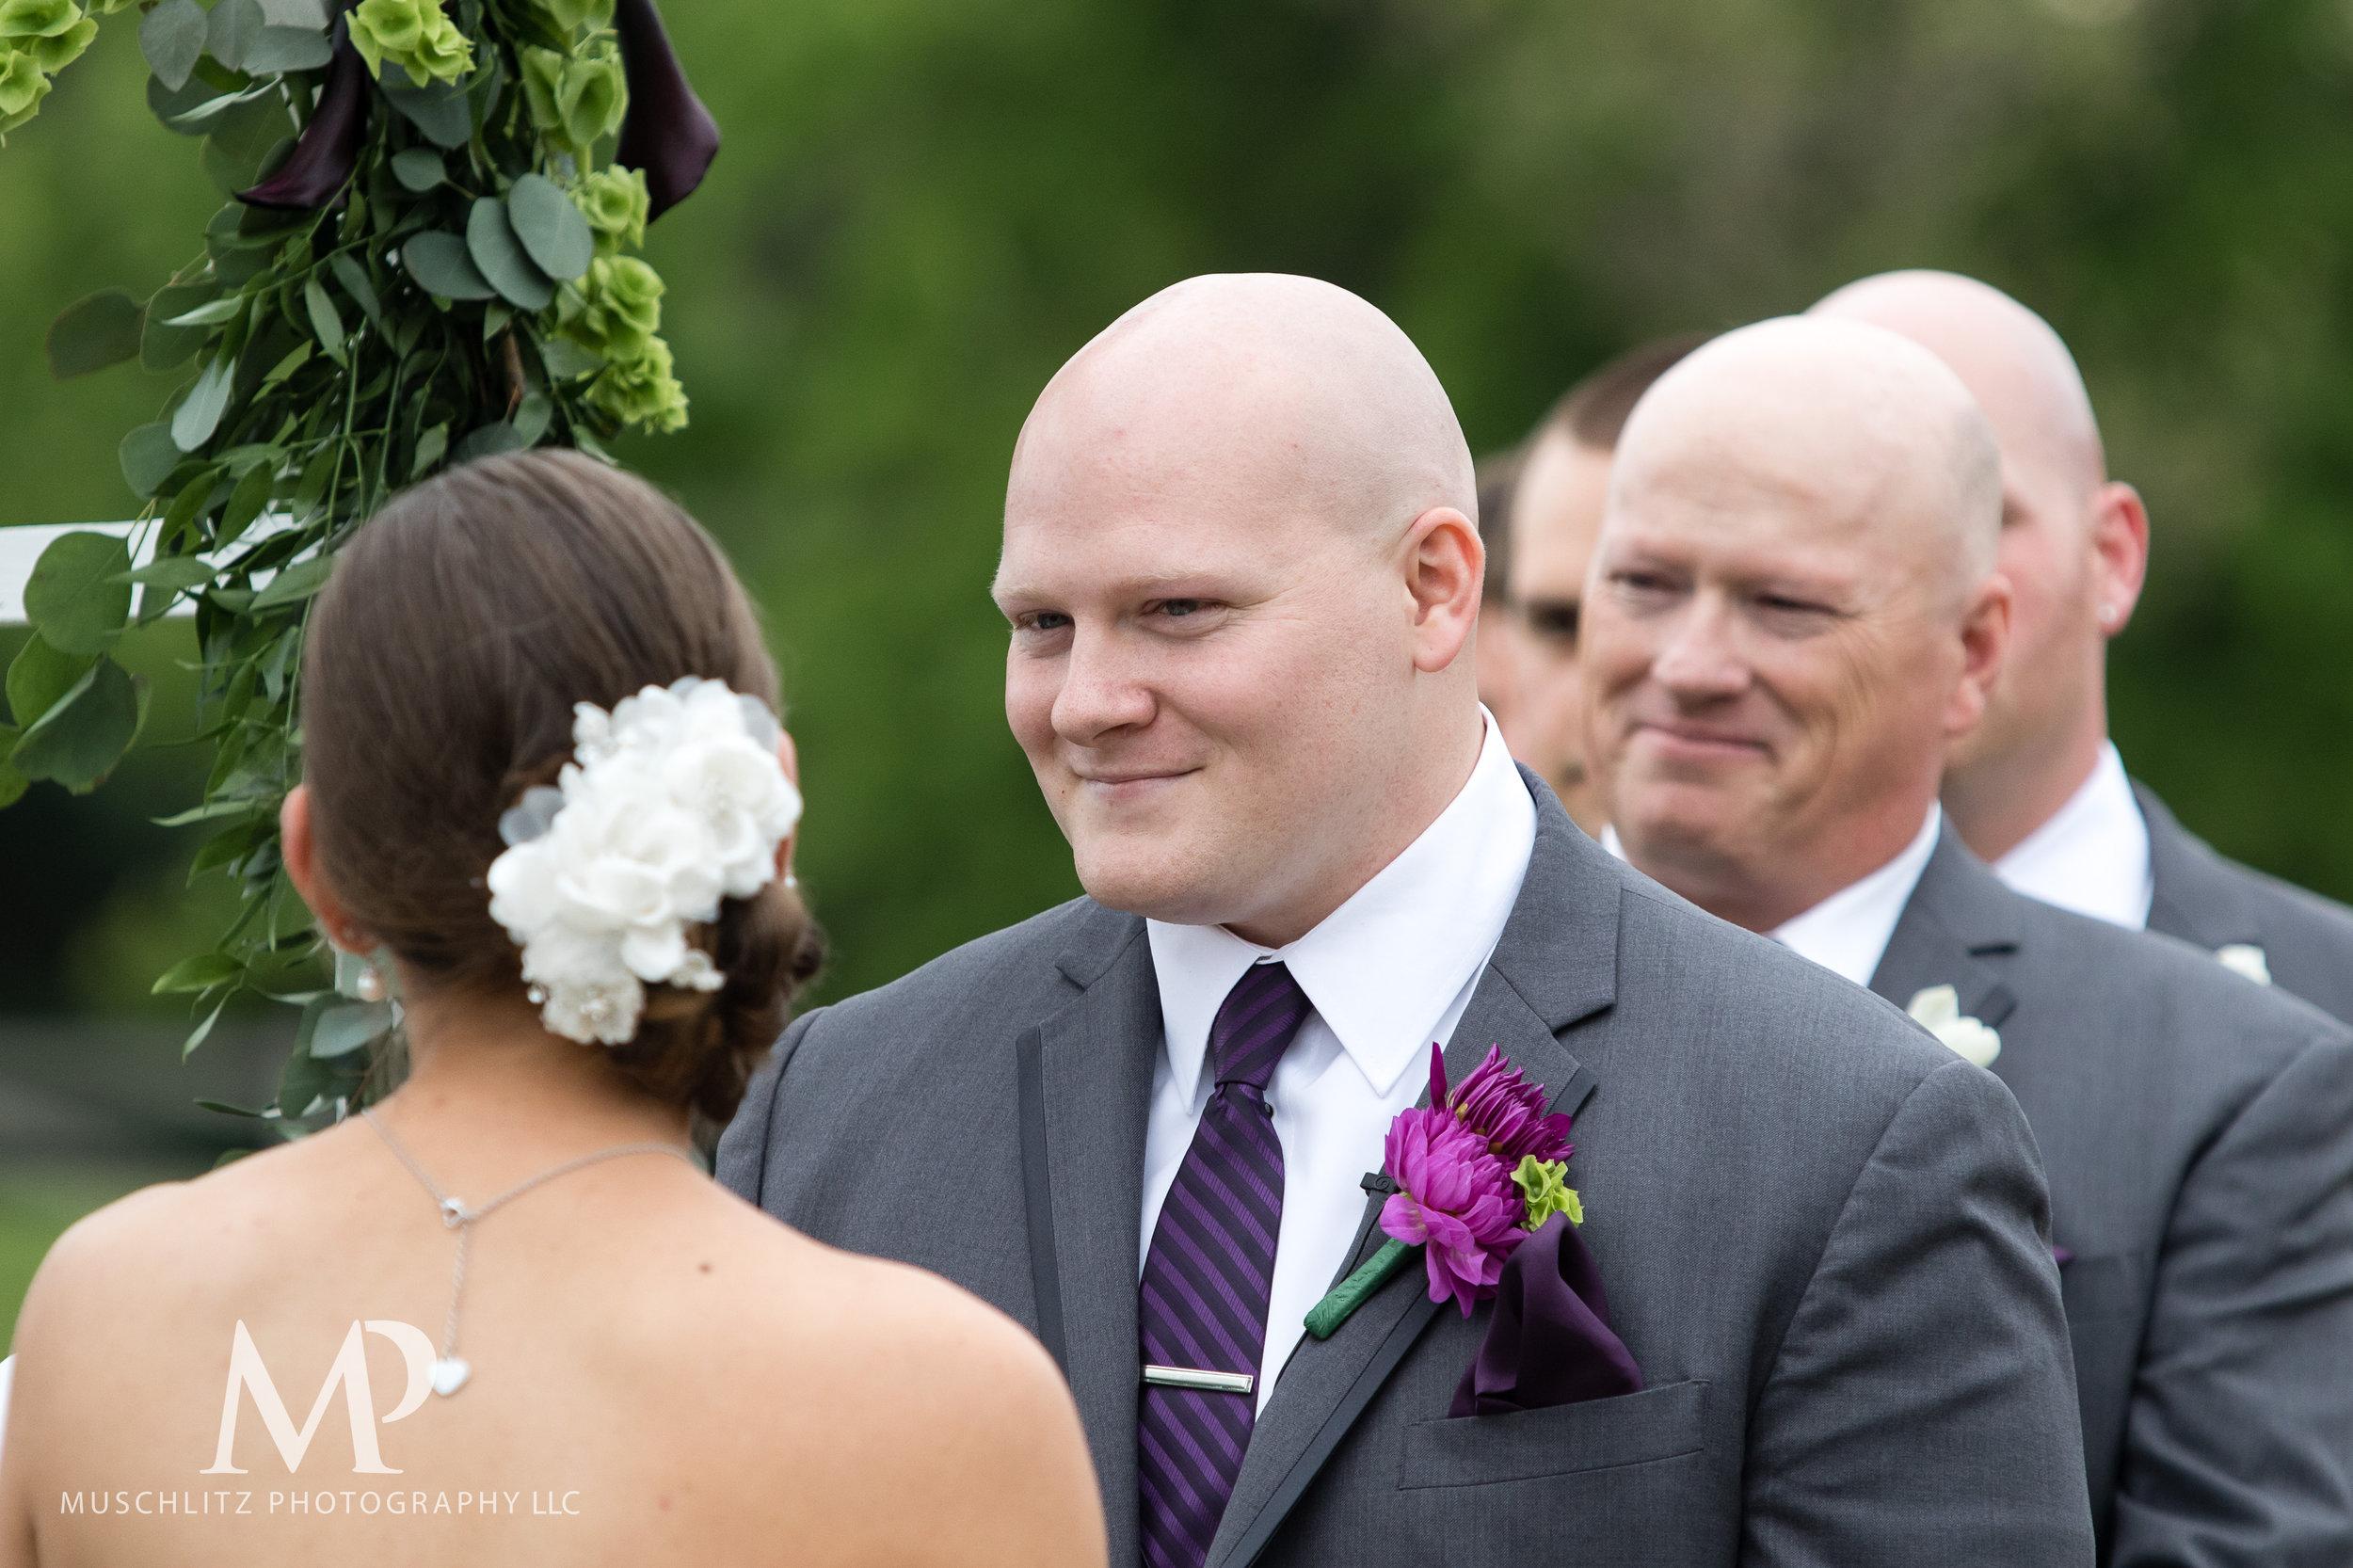 club-at-corazon-wedding-ceremony-reception-columbus-dublin-ohio-ohio-university-theme-034.JPG